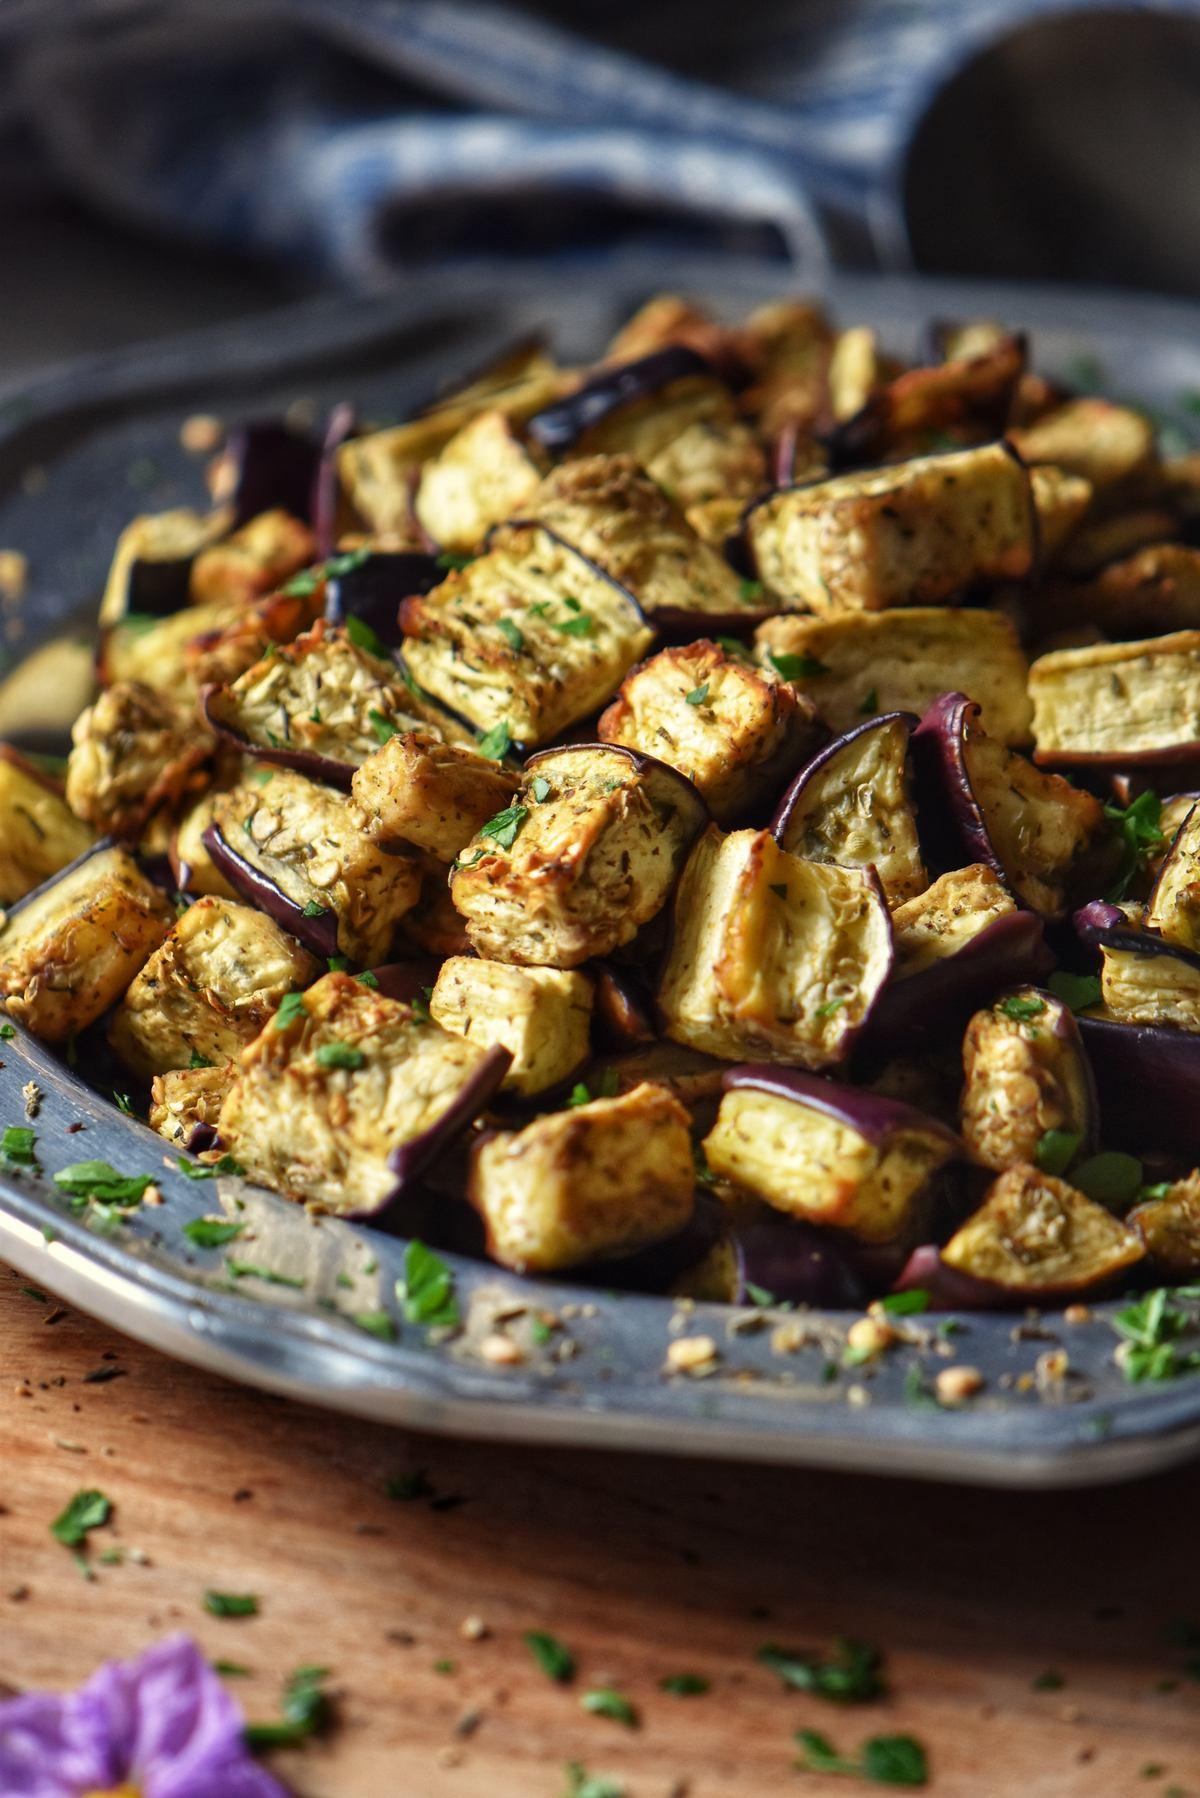 Golden air fryer eggplant on a silver platter.